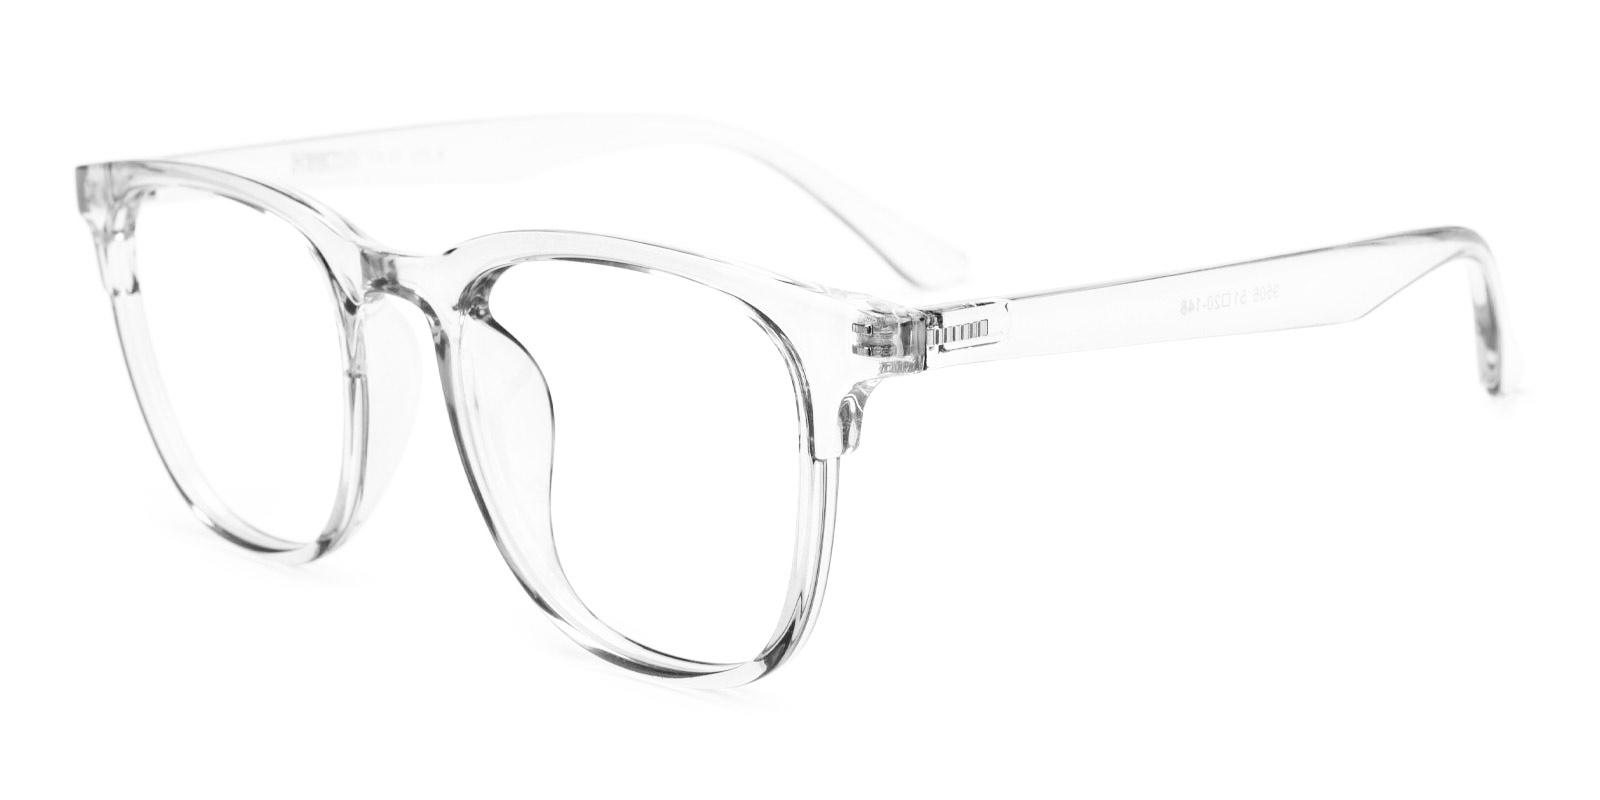 Luck-Translucent-Rectangle-TR-Eyeglasses-detail